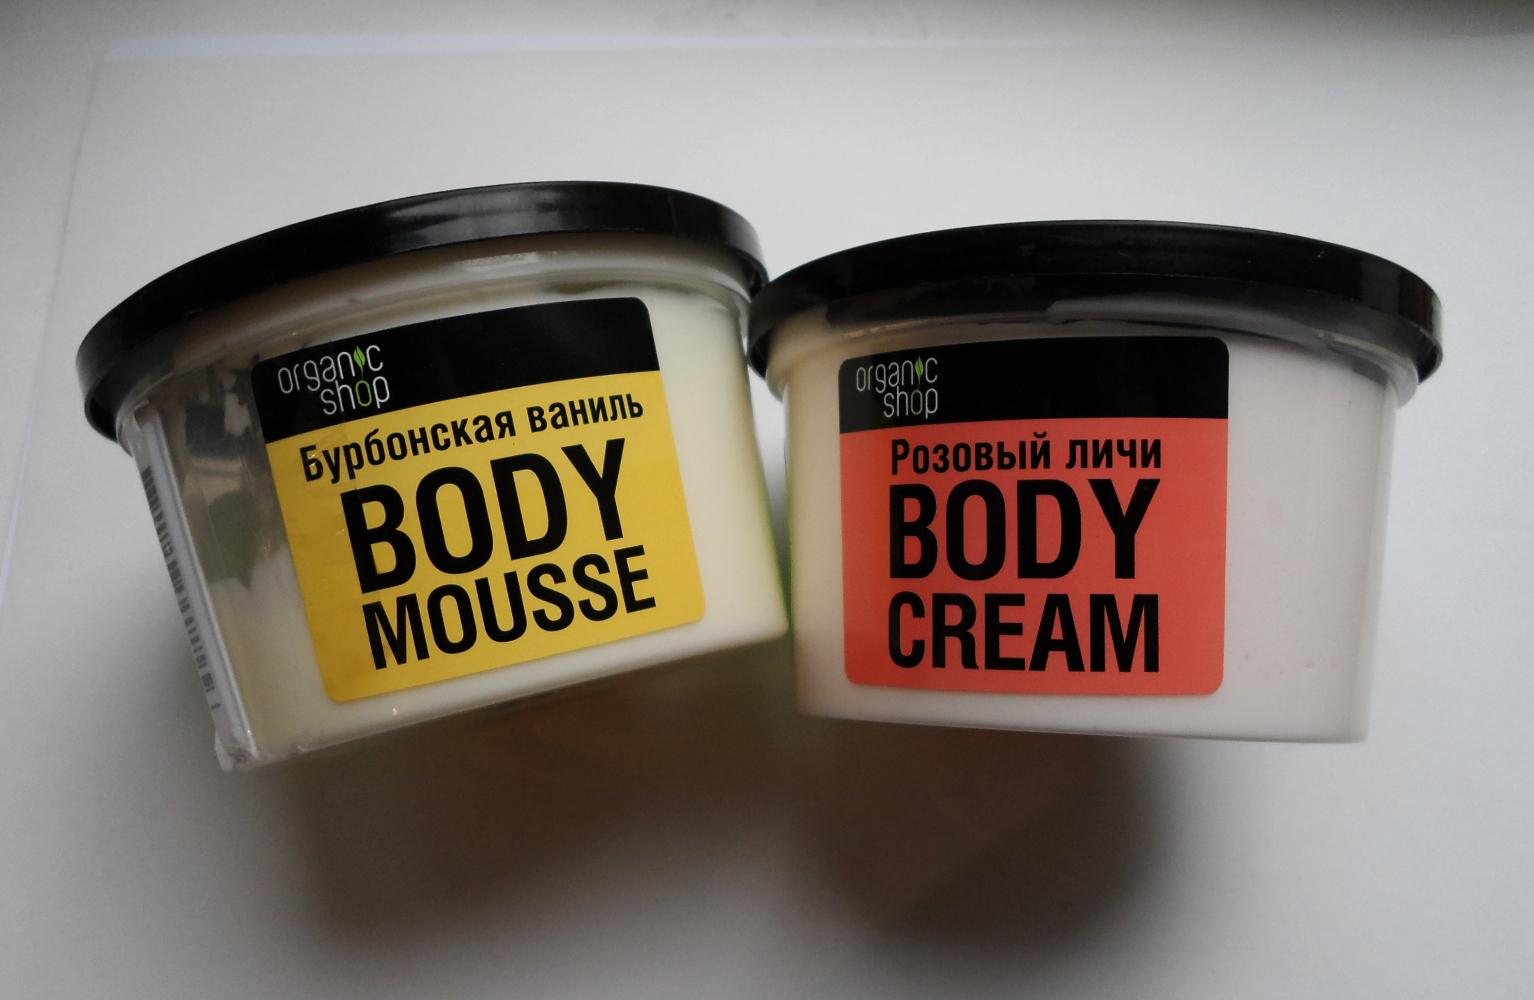 organic shop cosmeticsbody cream body mousse vanilla lichee